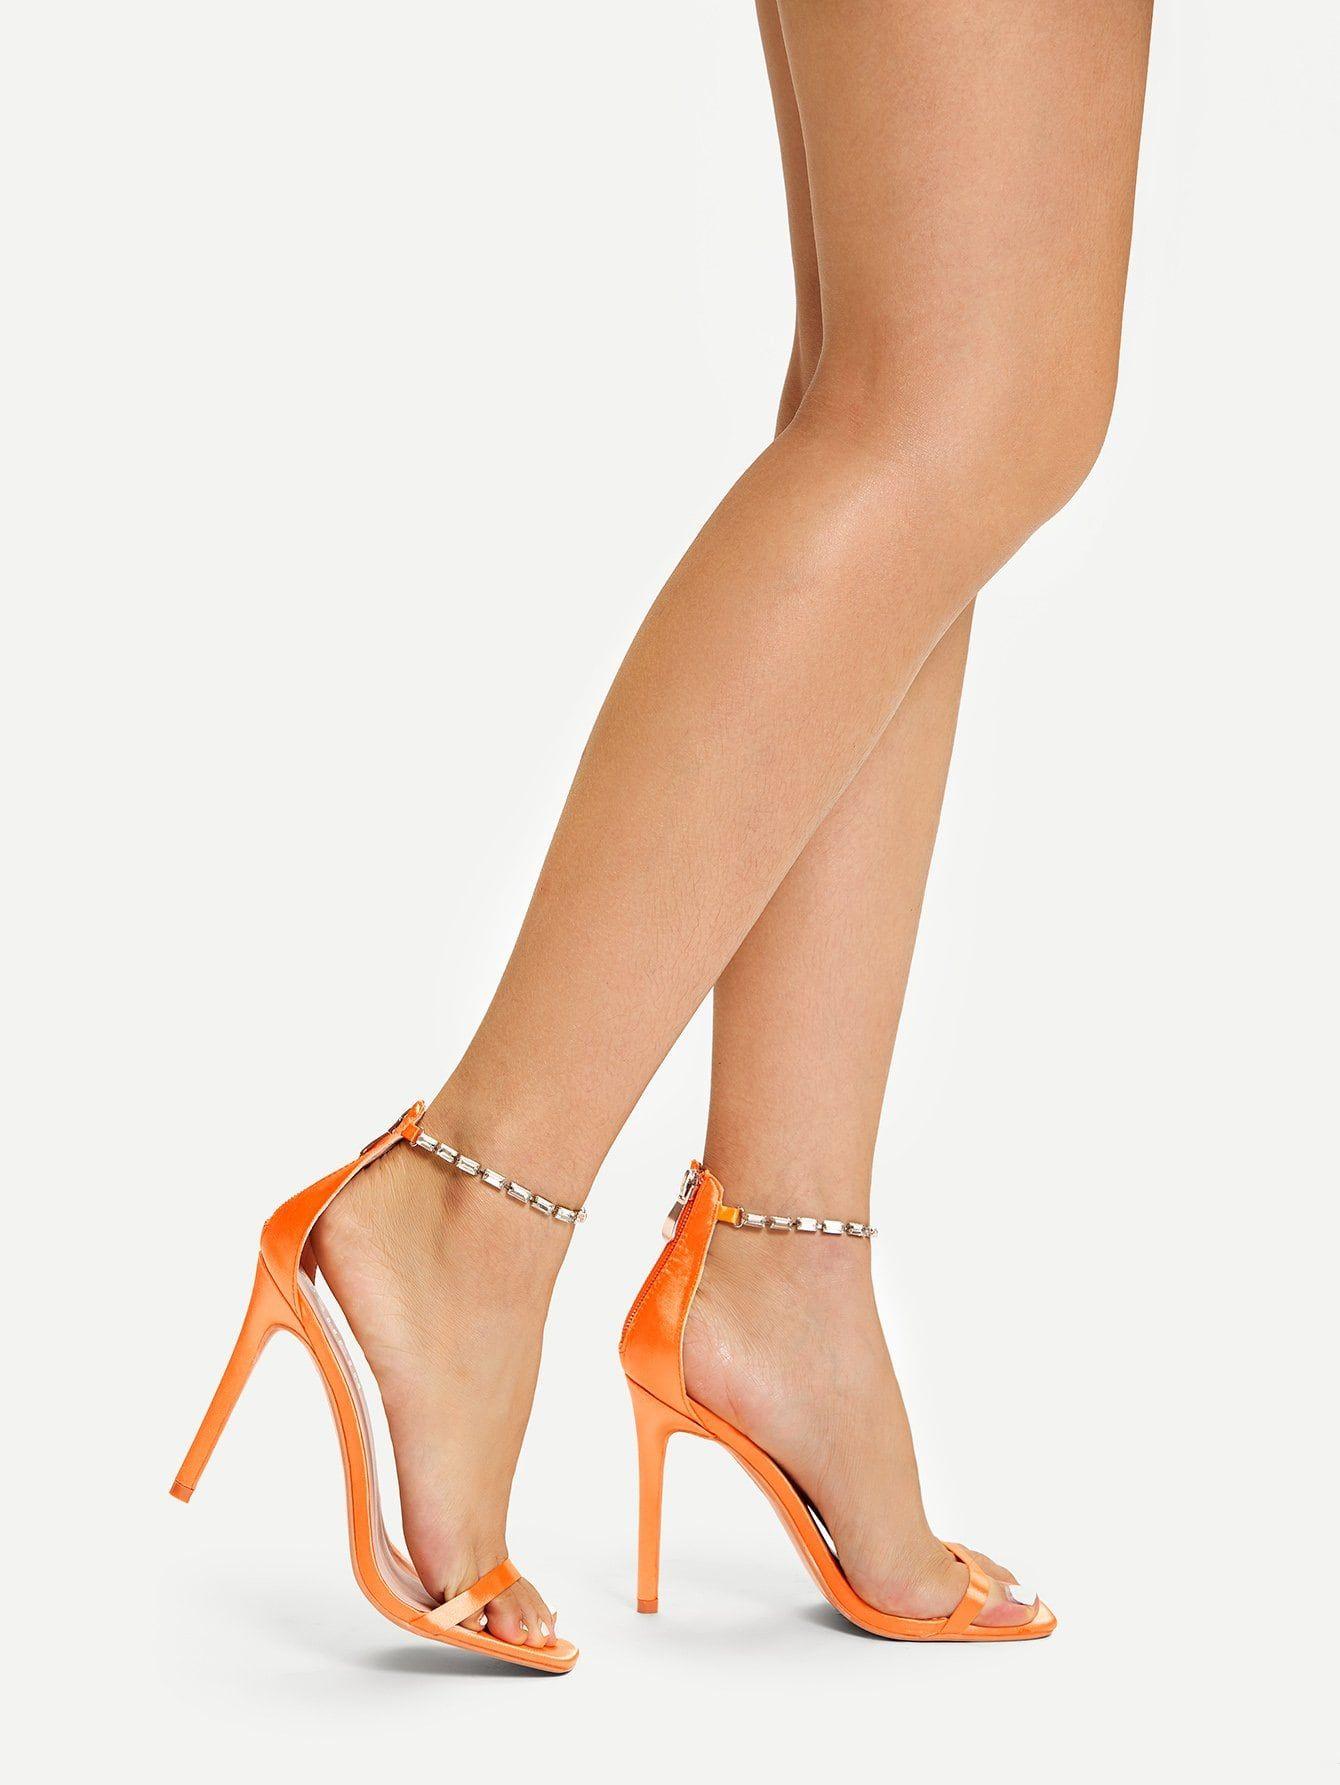 76174b37038 Elegant Square Toe and Open Toe Plain Ankle strap Orange High Heel ...